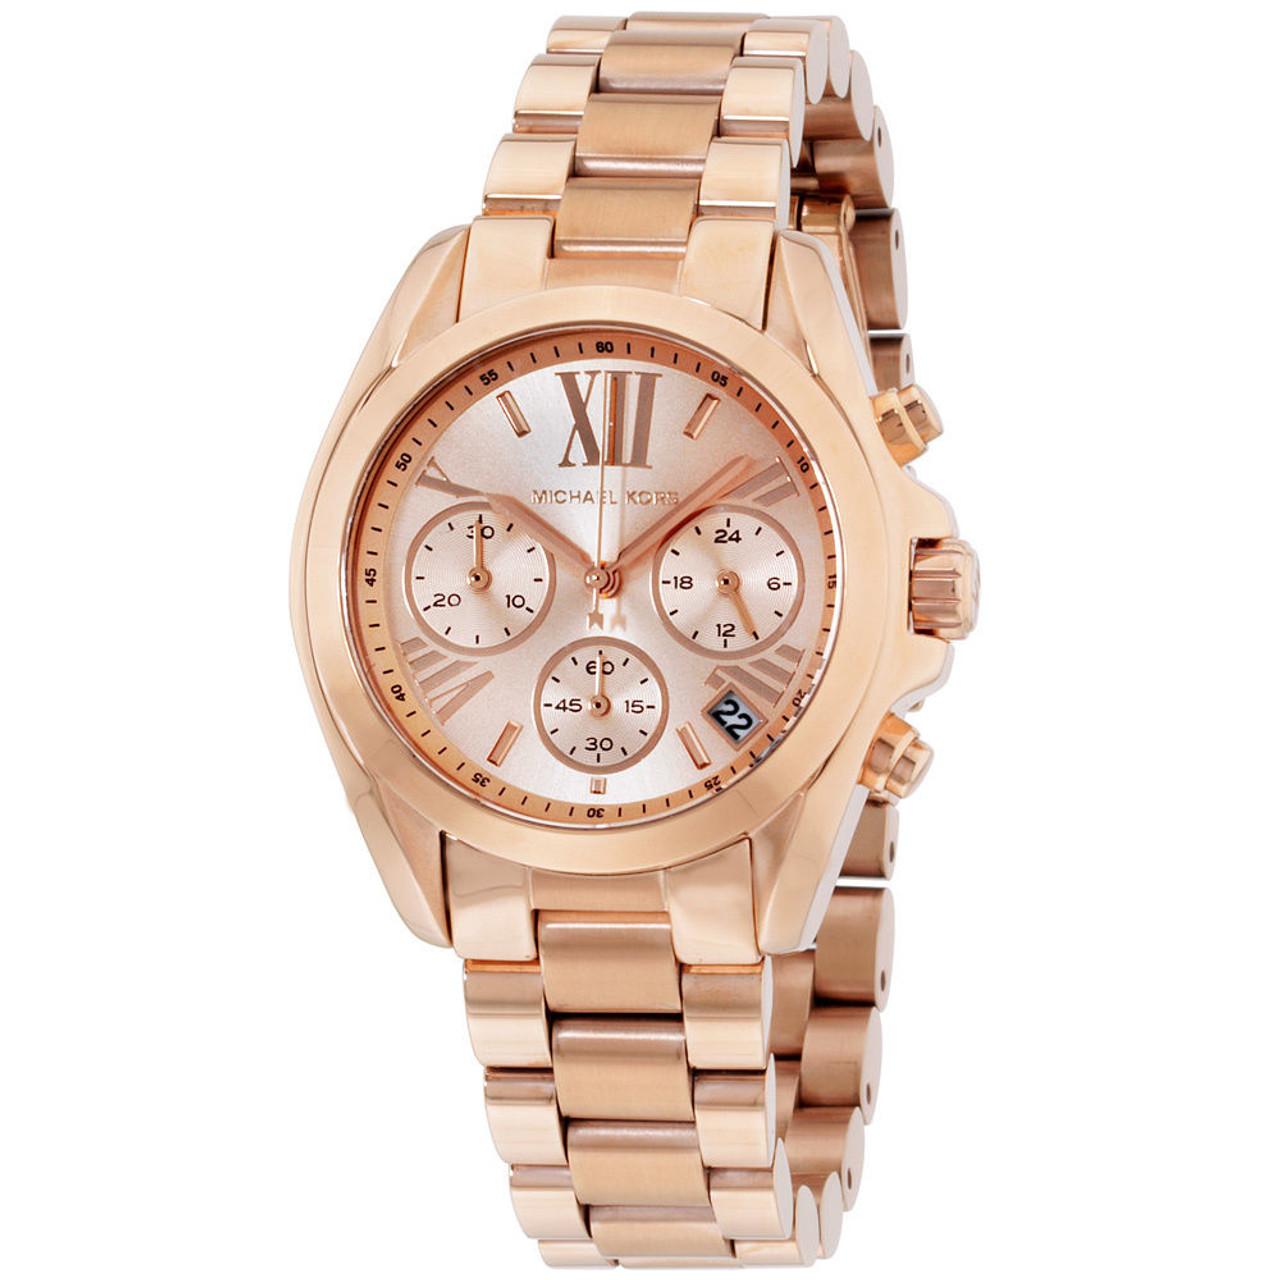 4b2891a0bf22 Michael Kors MK5799 Bradshaw Chronograph Rosetone Stainless Steel Womens  Watch - The Royal Gift Inc.